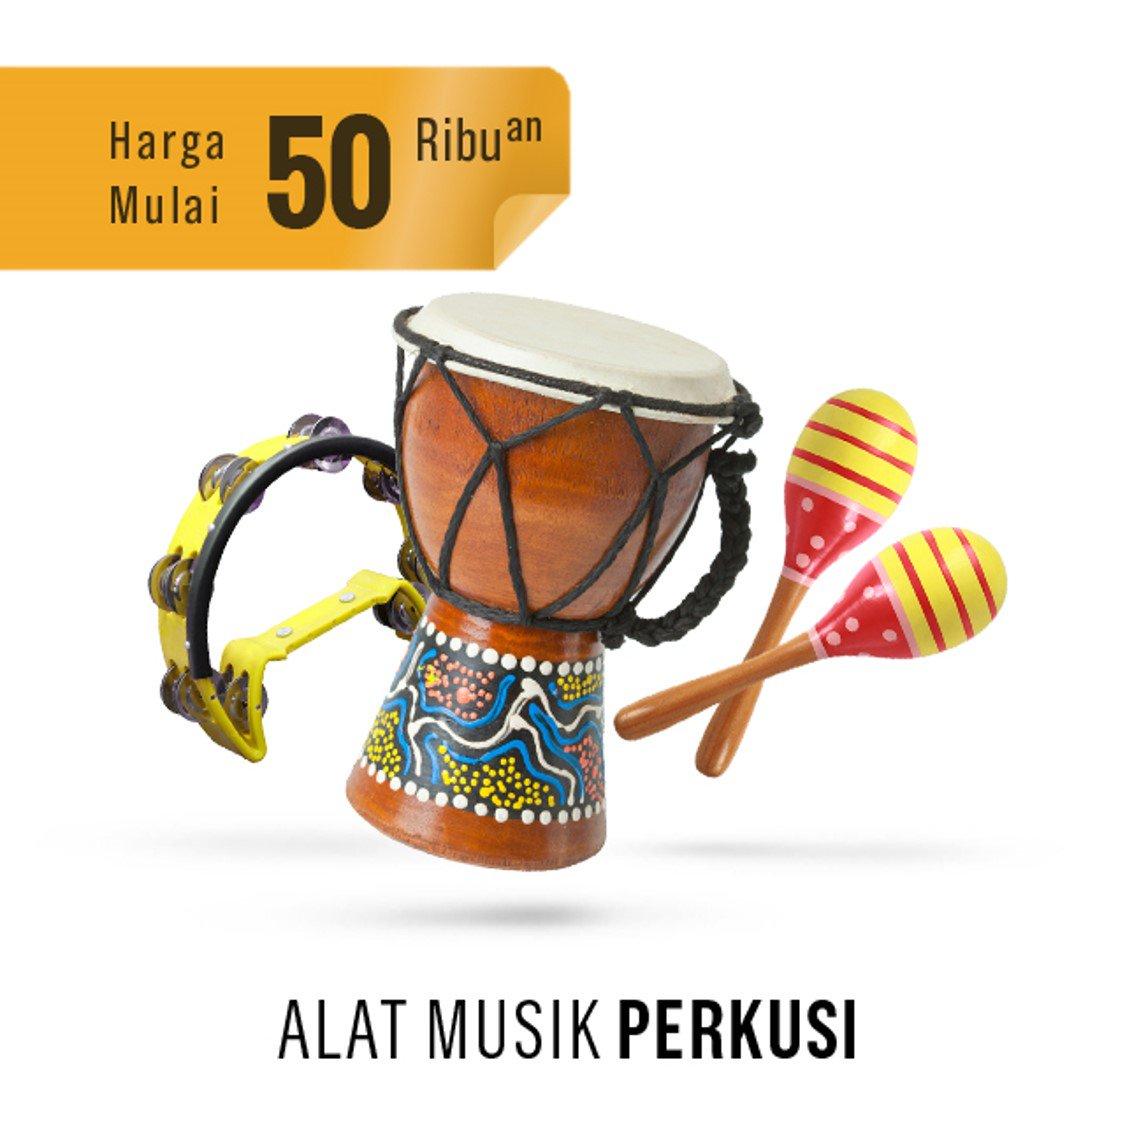 80+ Gambar Alat Musik Perkusi Terlihat Keren